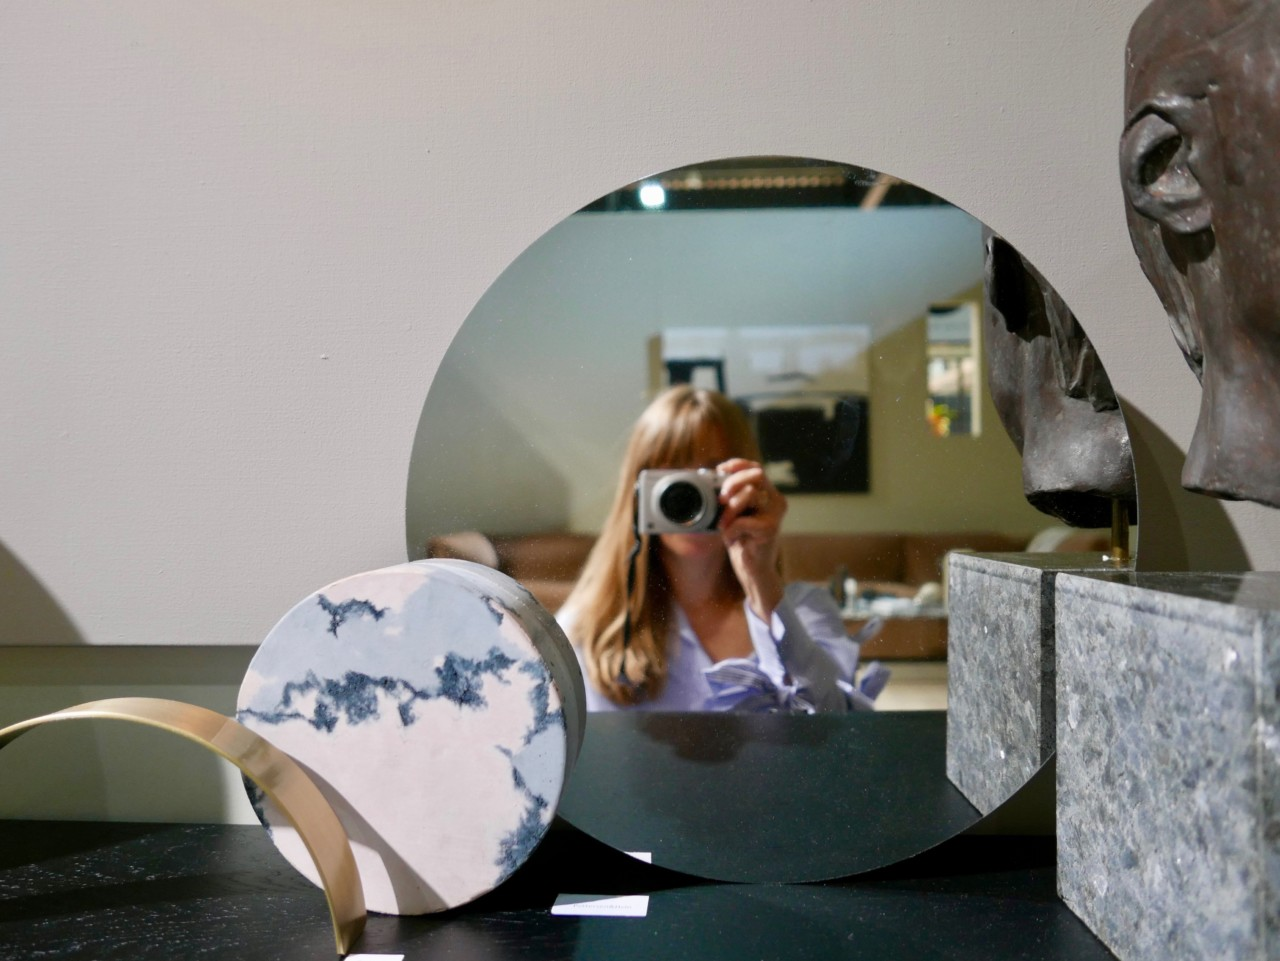 Anja rod-Oslo design fair mirror